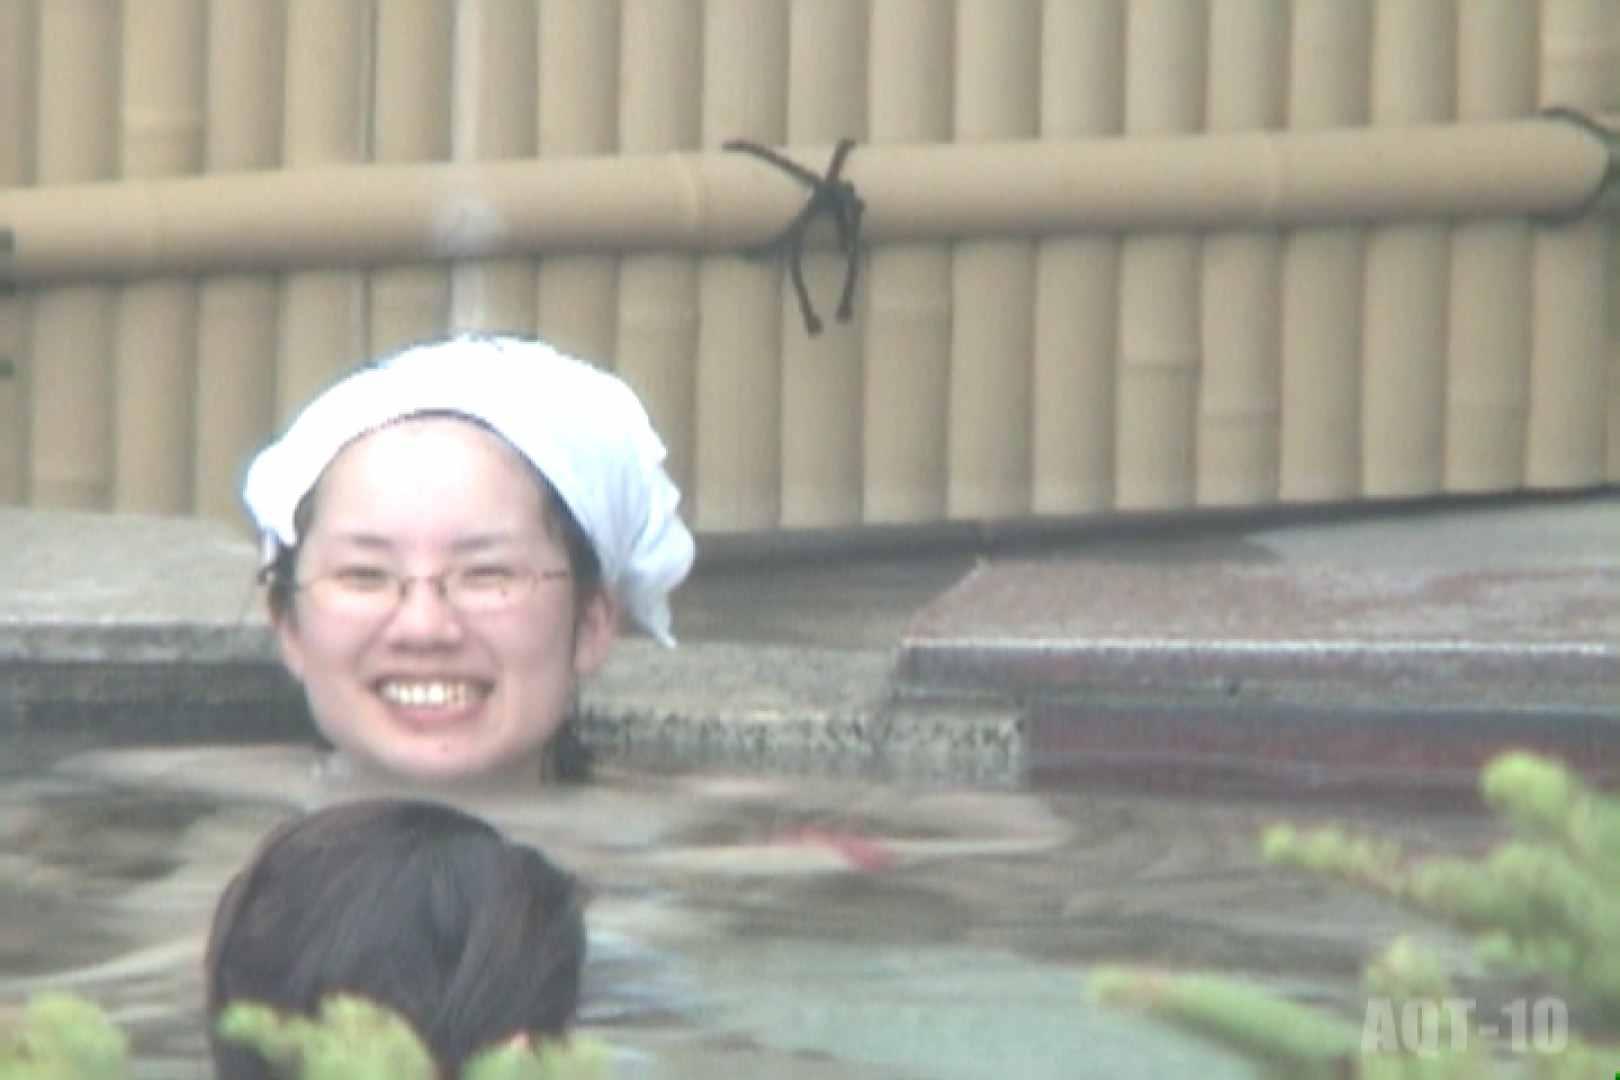 Aquaな露天風呂Vol.796 OLエロ画像 隠し撮りセックス画像 51PICs 17